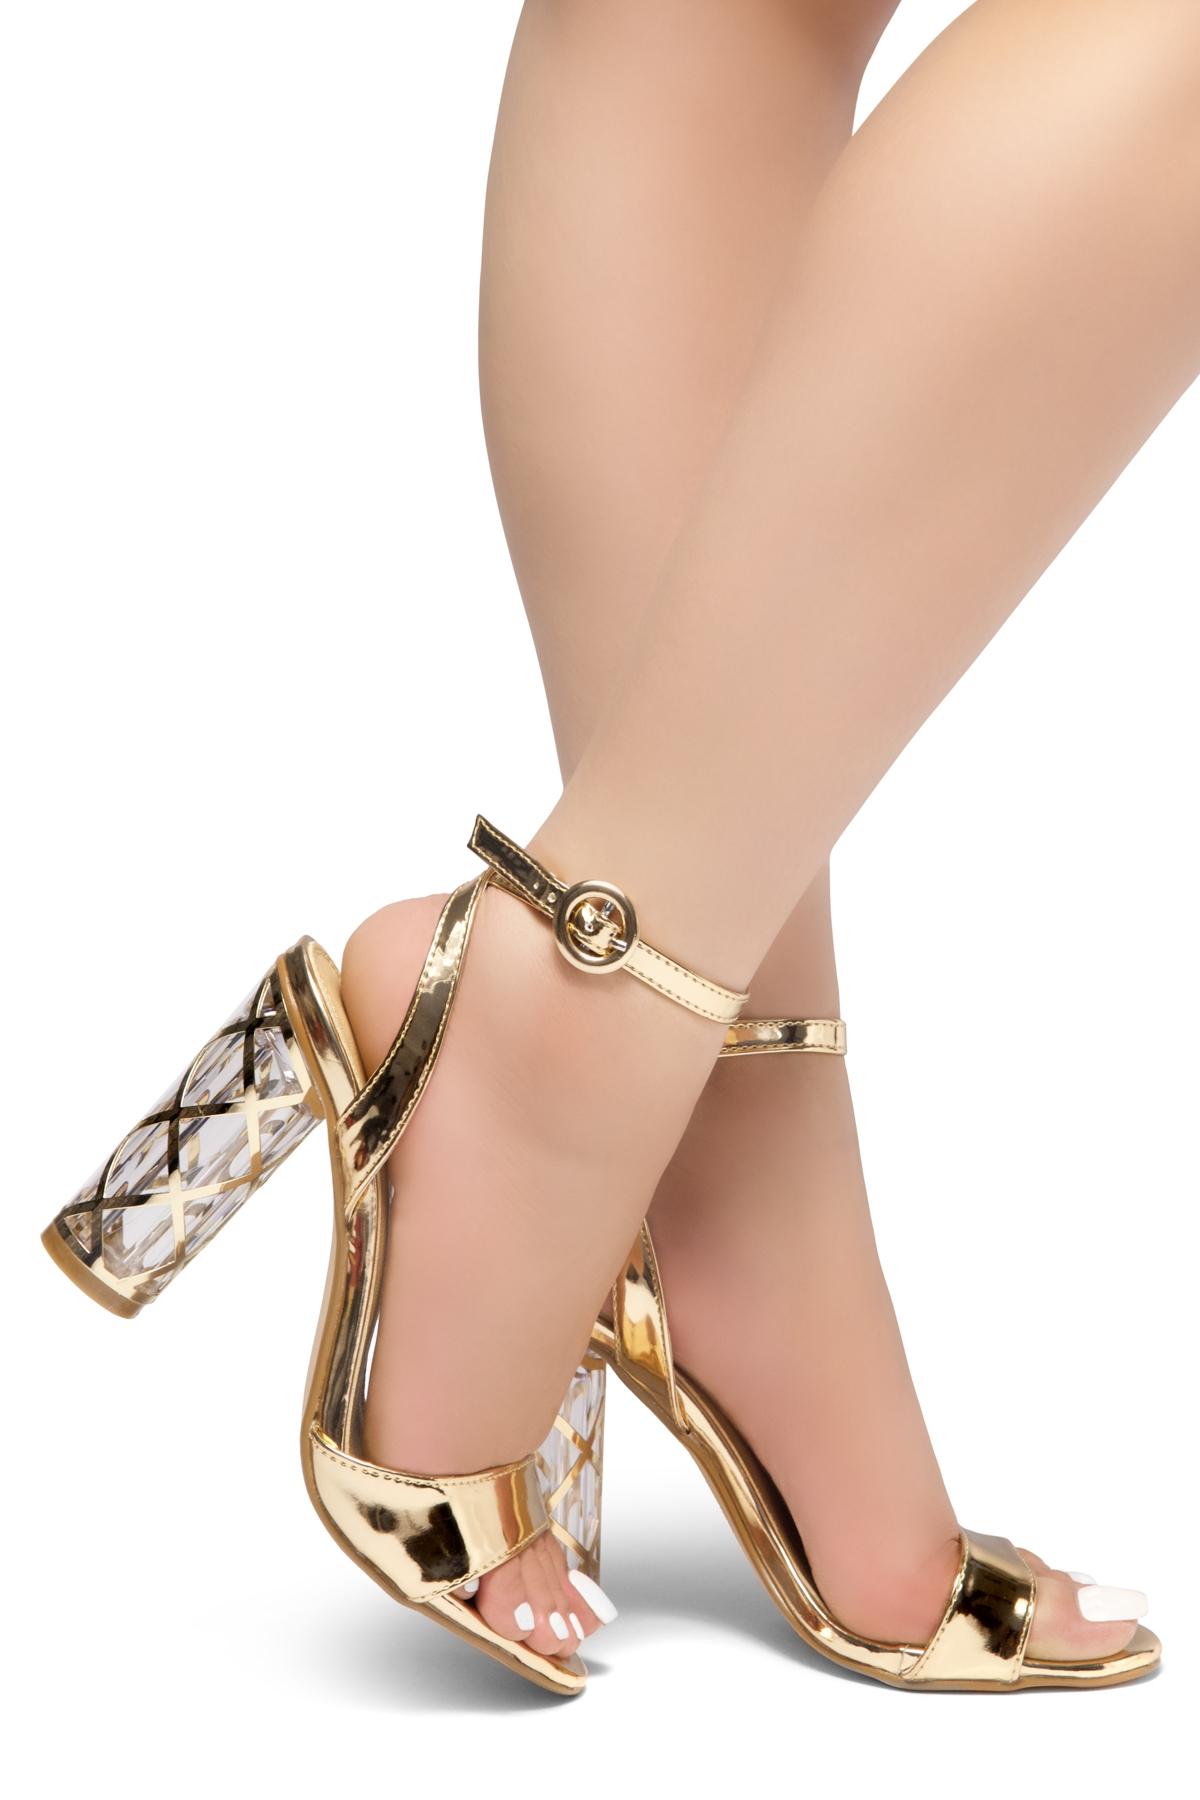 426b69635 HerStyle Shine Factor-Perspex cylinder heel, Open Toe, Ankle Strap Sandals  (RoseGold)